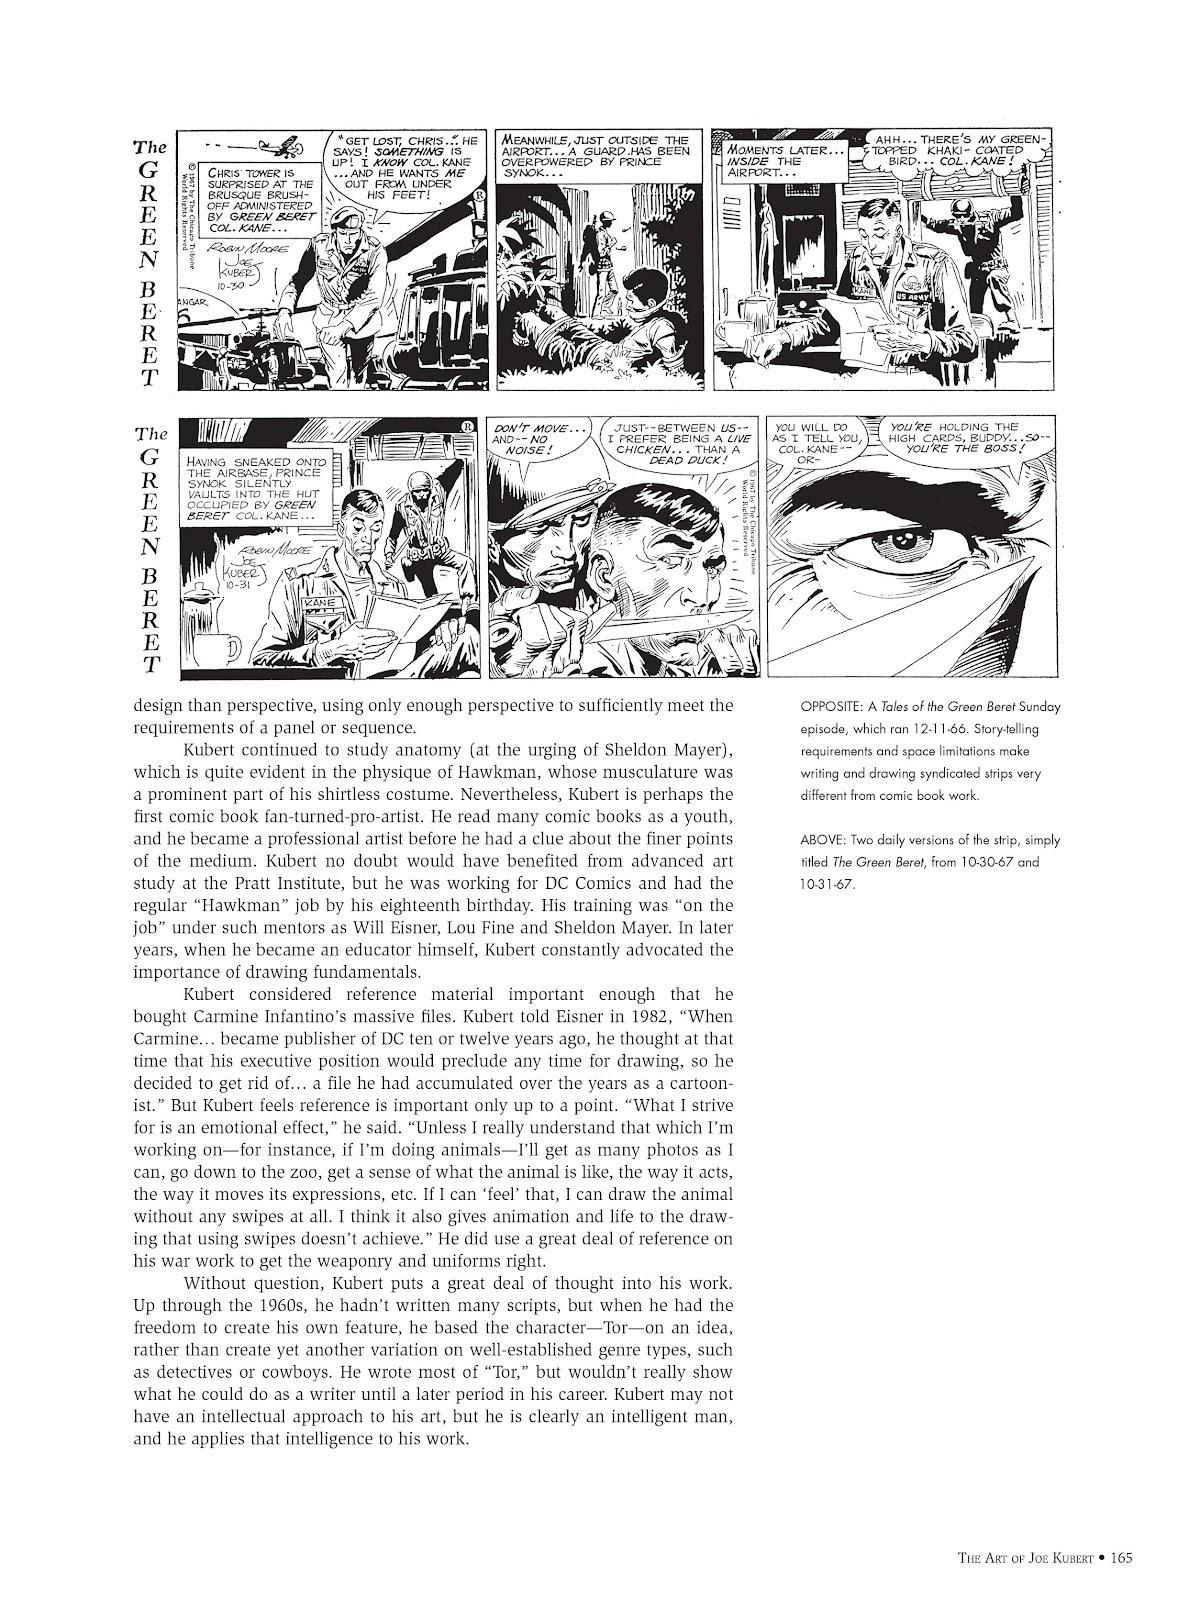 Read online The Art of Joe Kubert comic -  Issue # TPB (Part 2) - 65